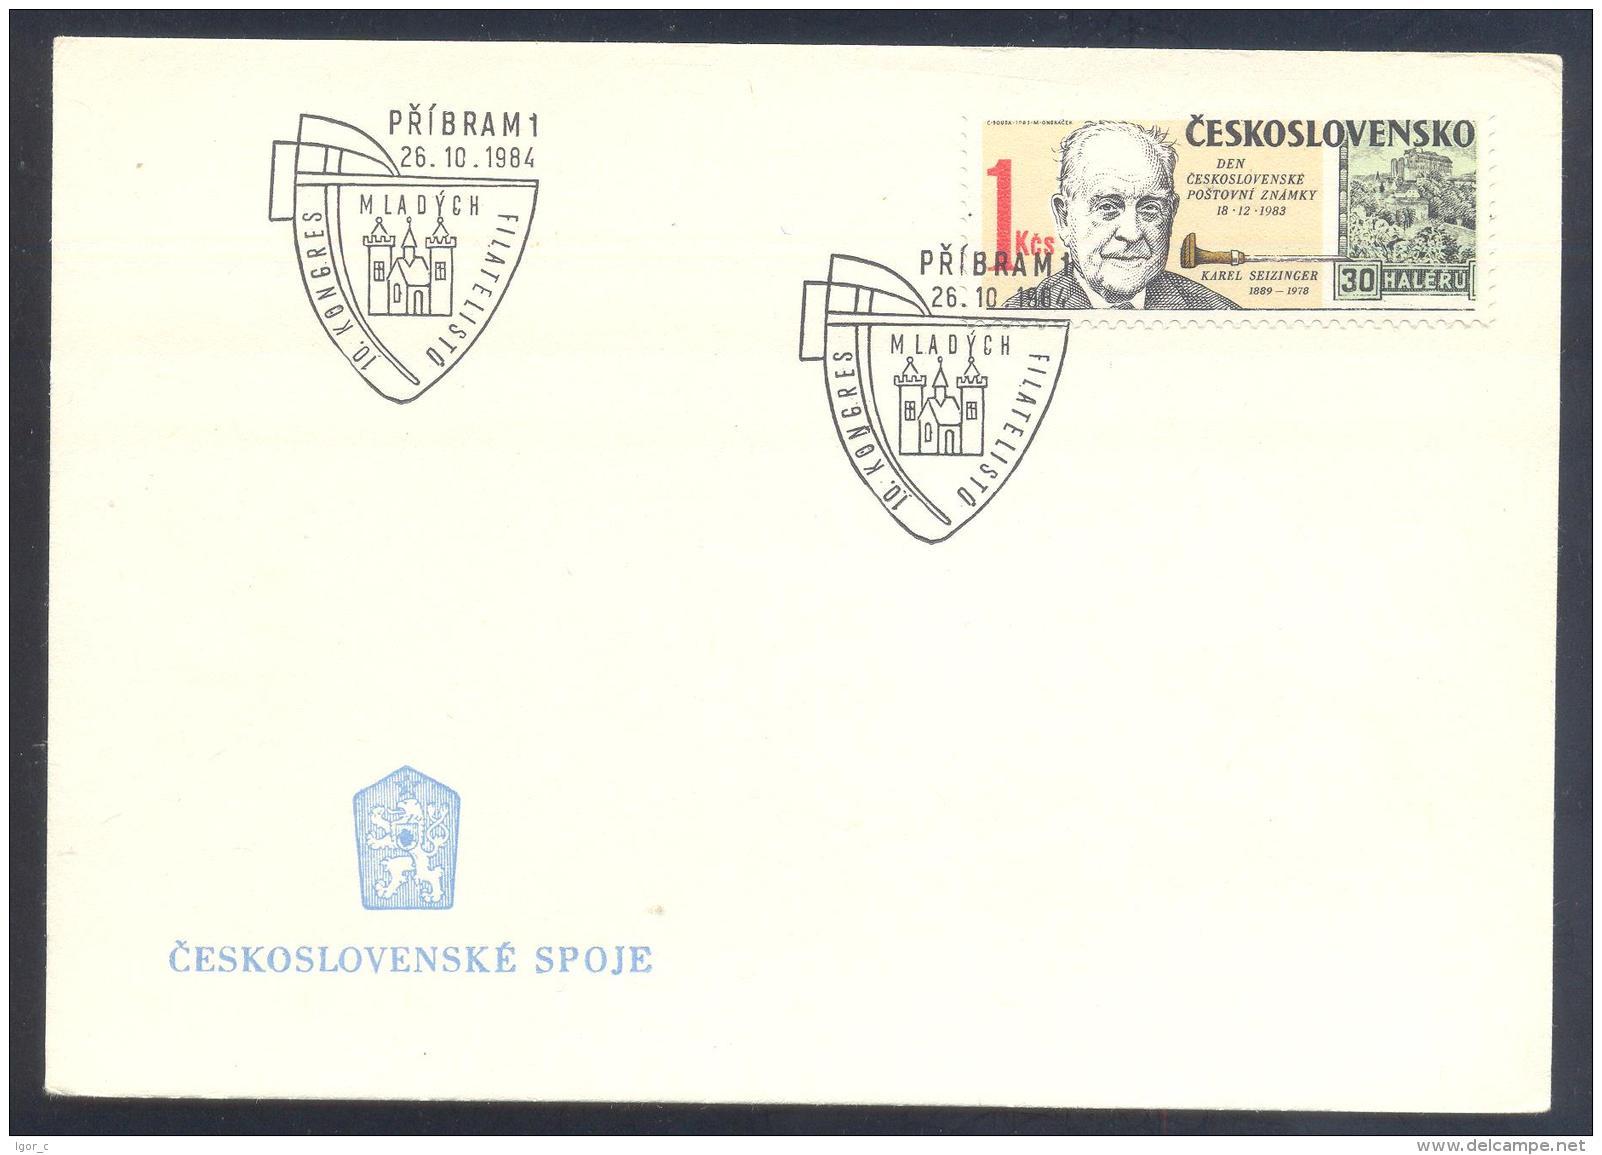 Czech Republic 1984 Card - Minerals Fosils Mine Mineralien Paleontolyogy Speleology Karel Seizinger Castle Schloss - Mineralien